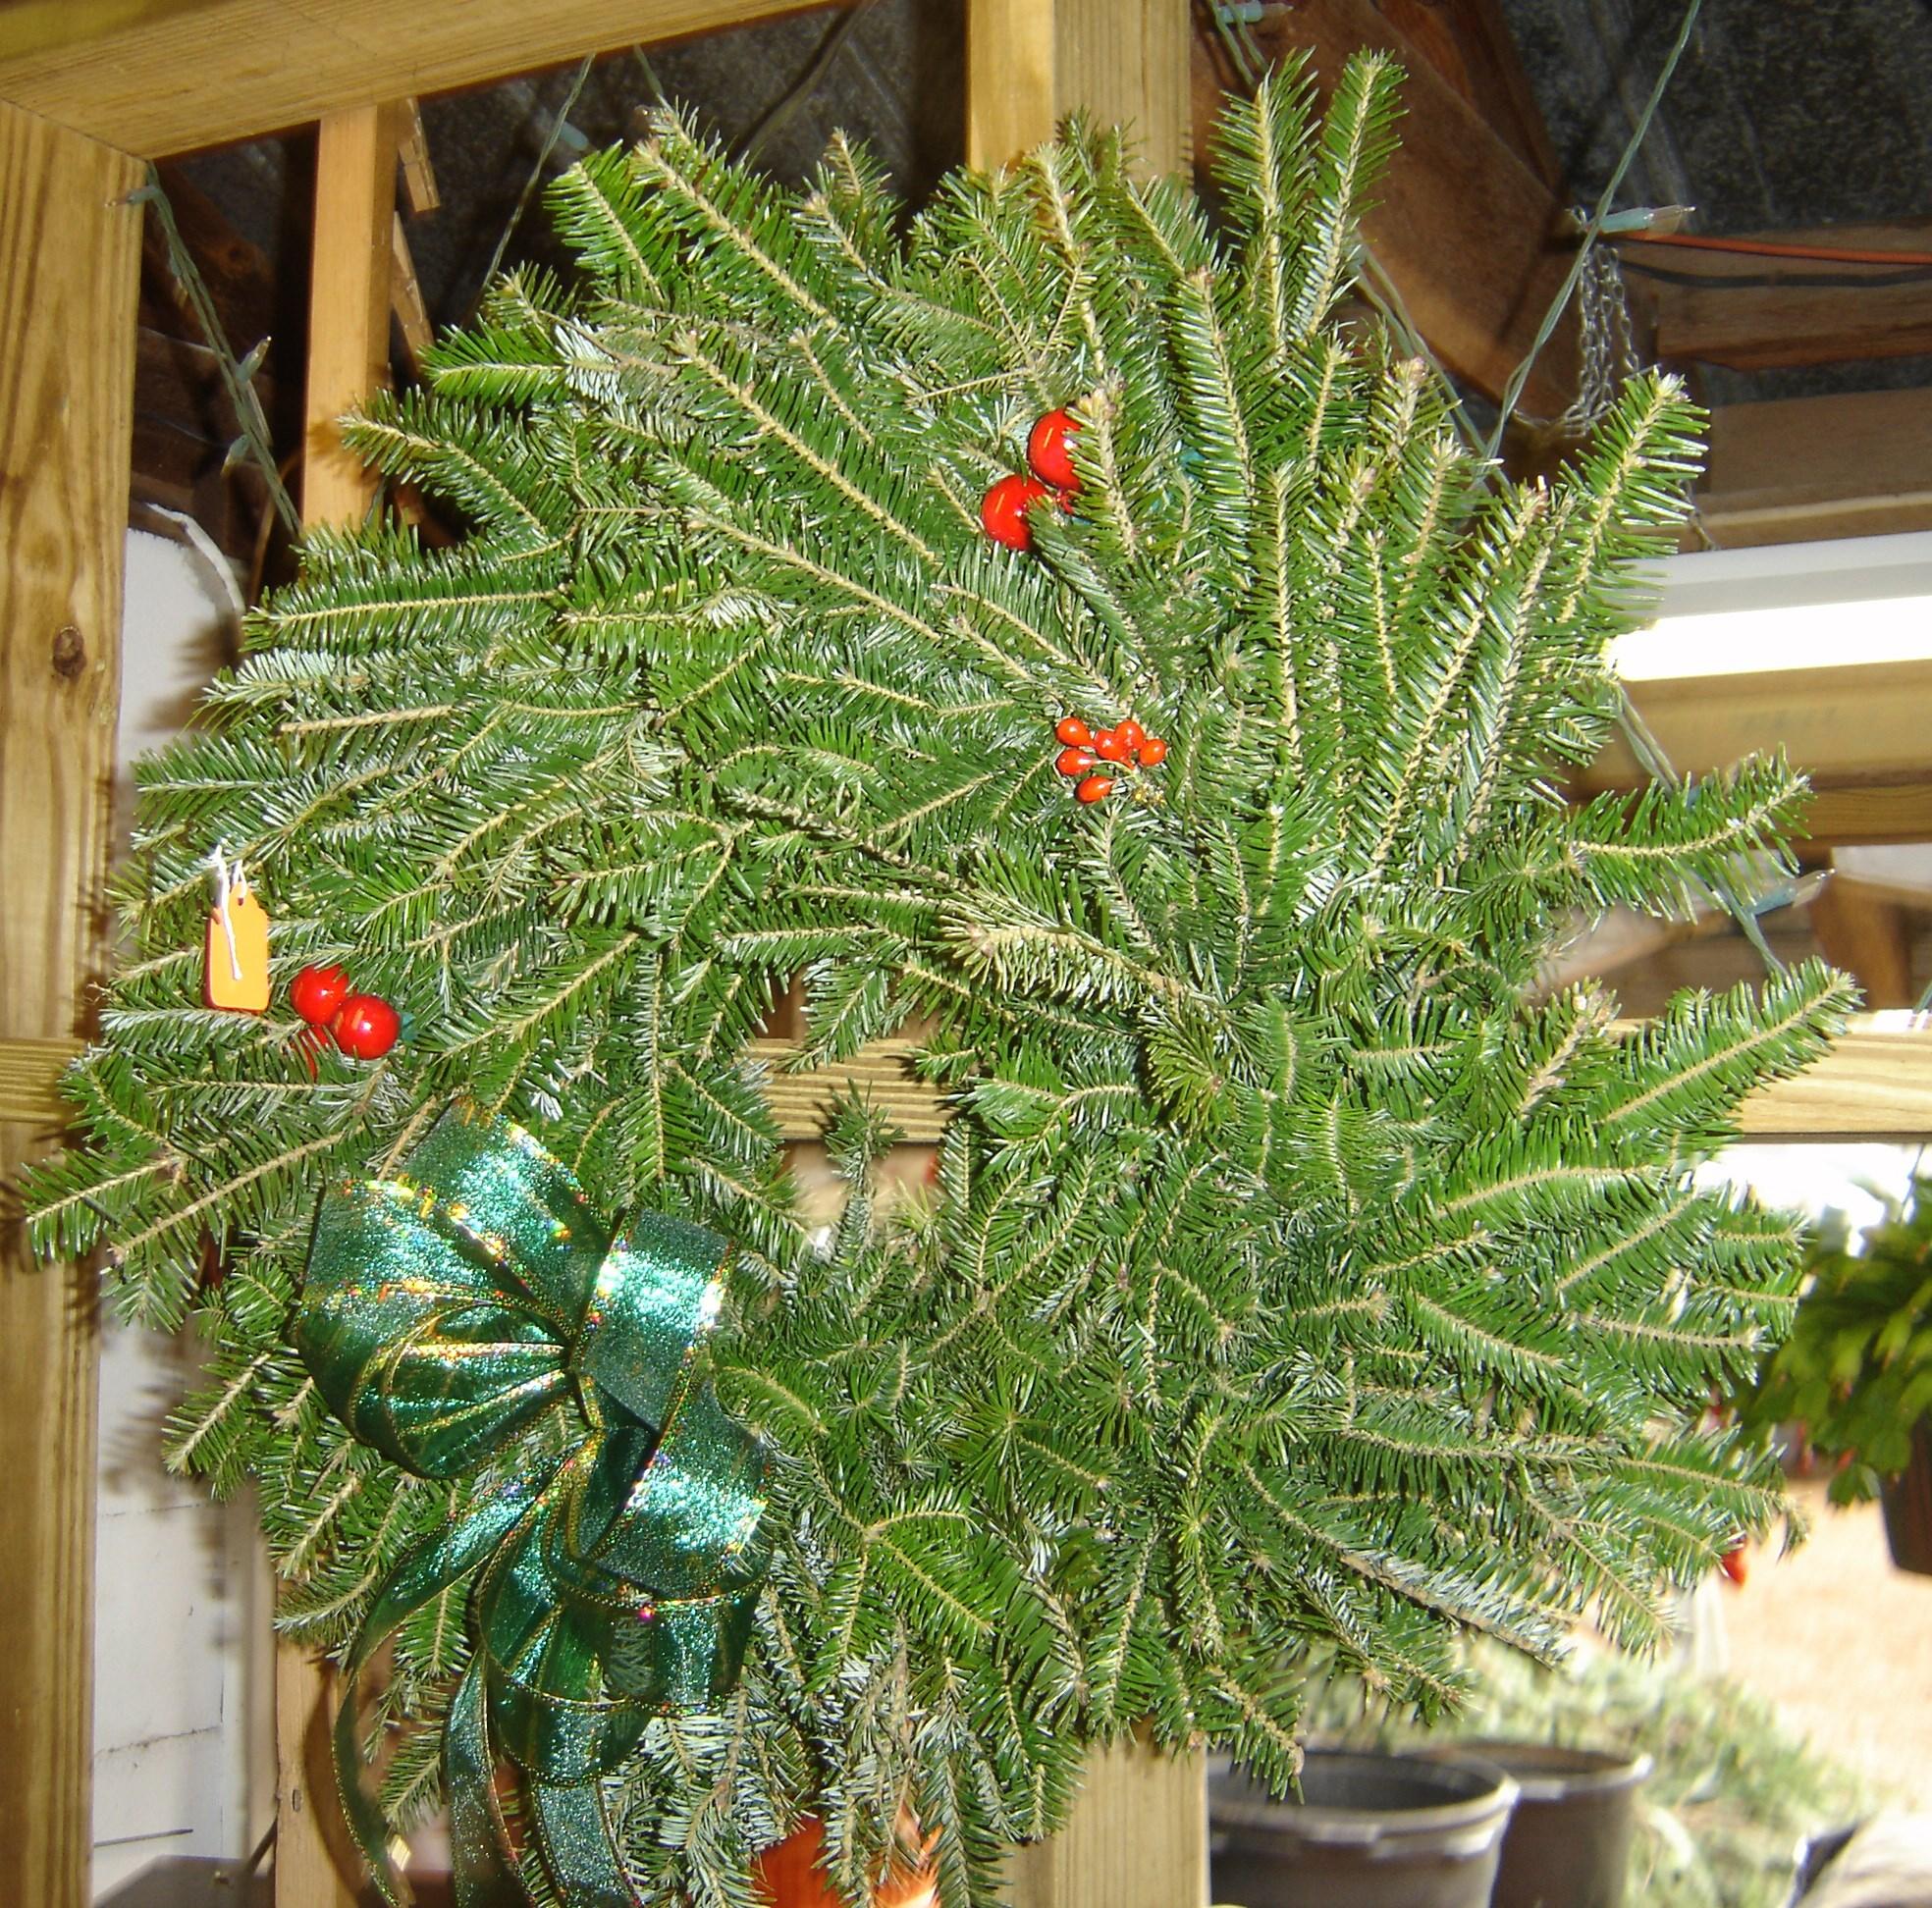 Cut Your Own Christmas Tree York Pa: Ergle Christmas Tree Farm Christmas Tree Farm